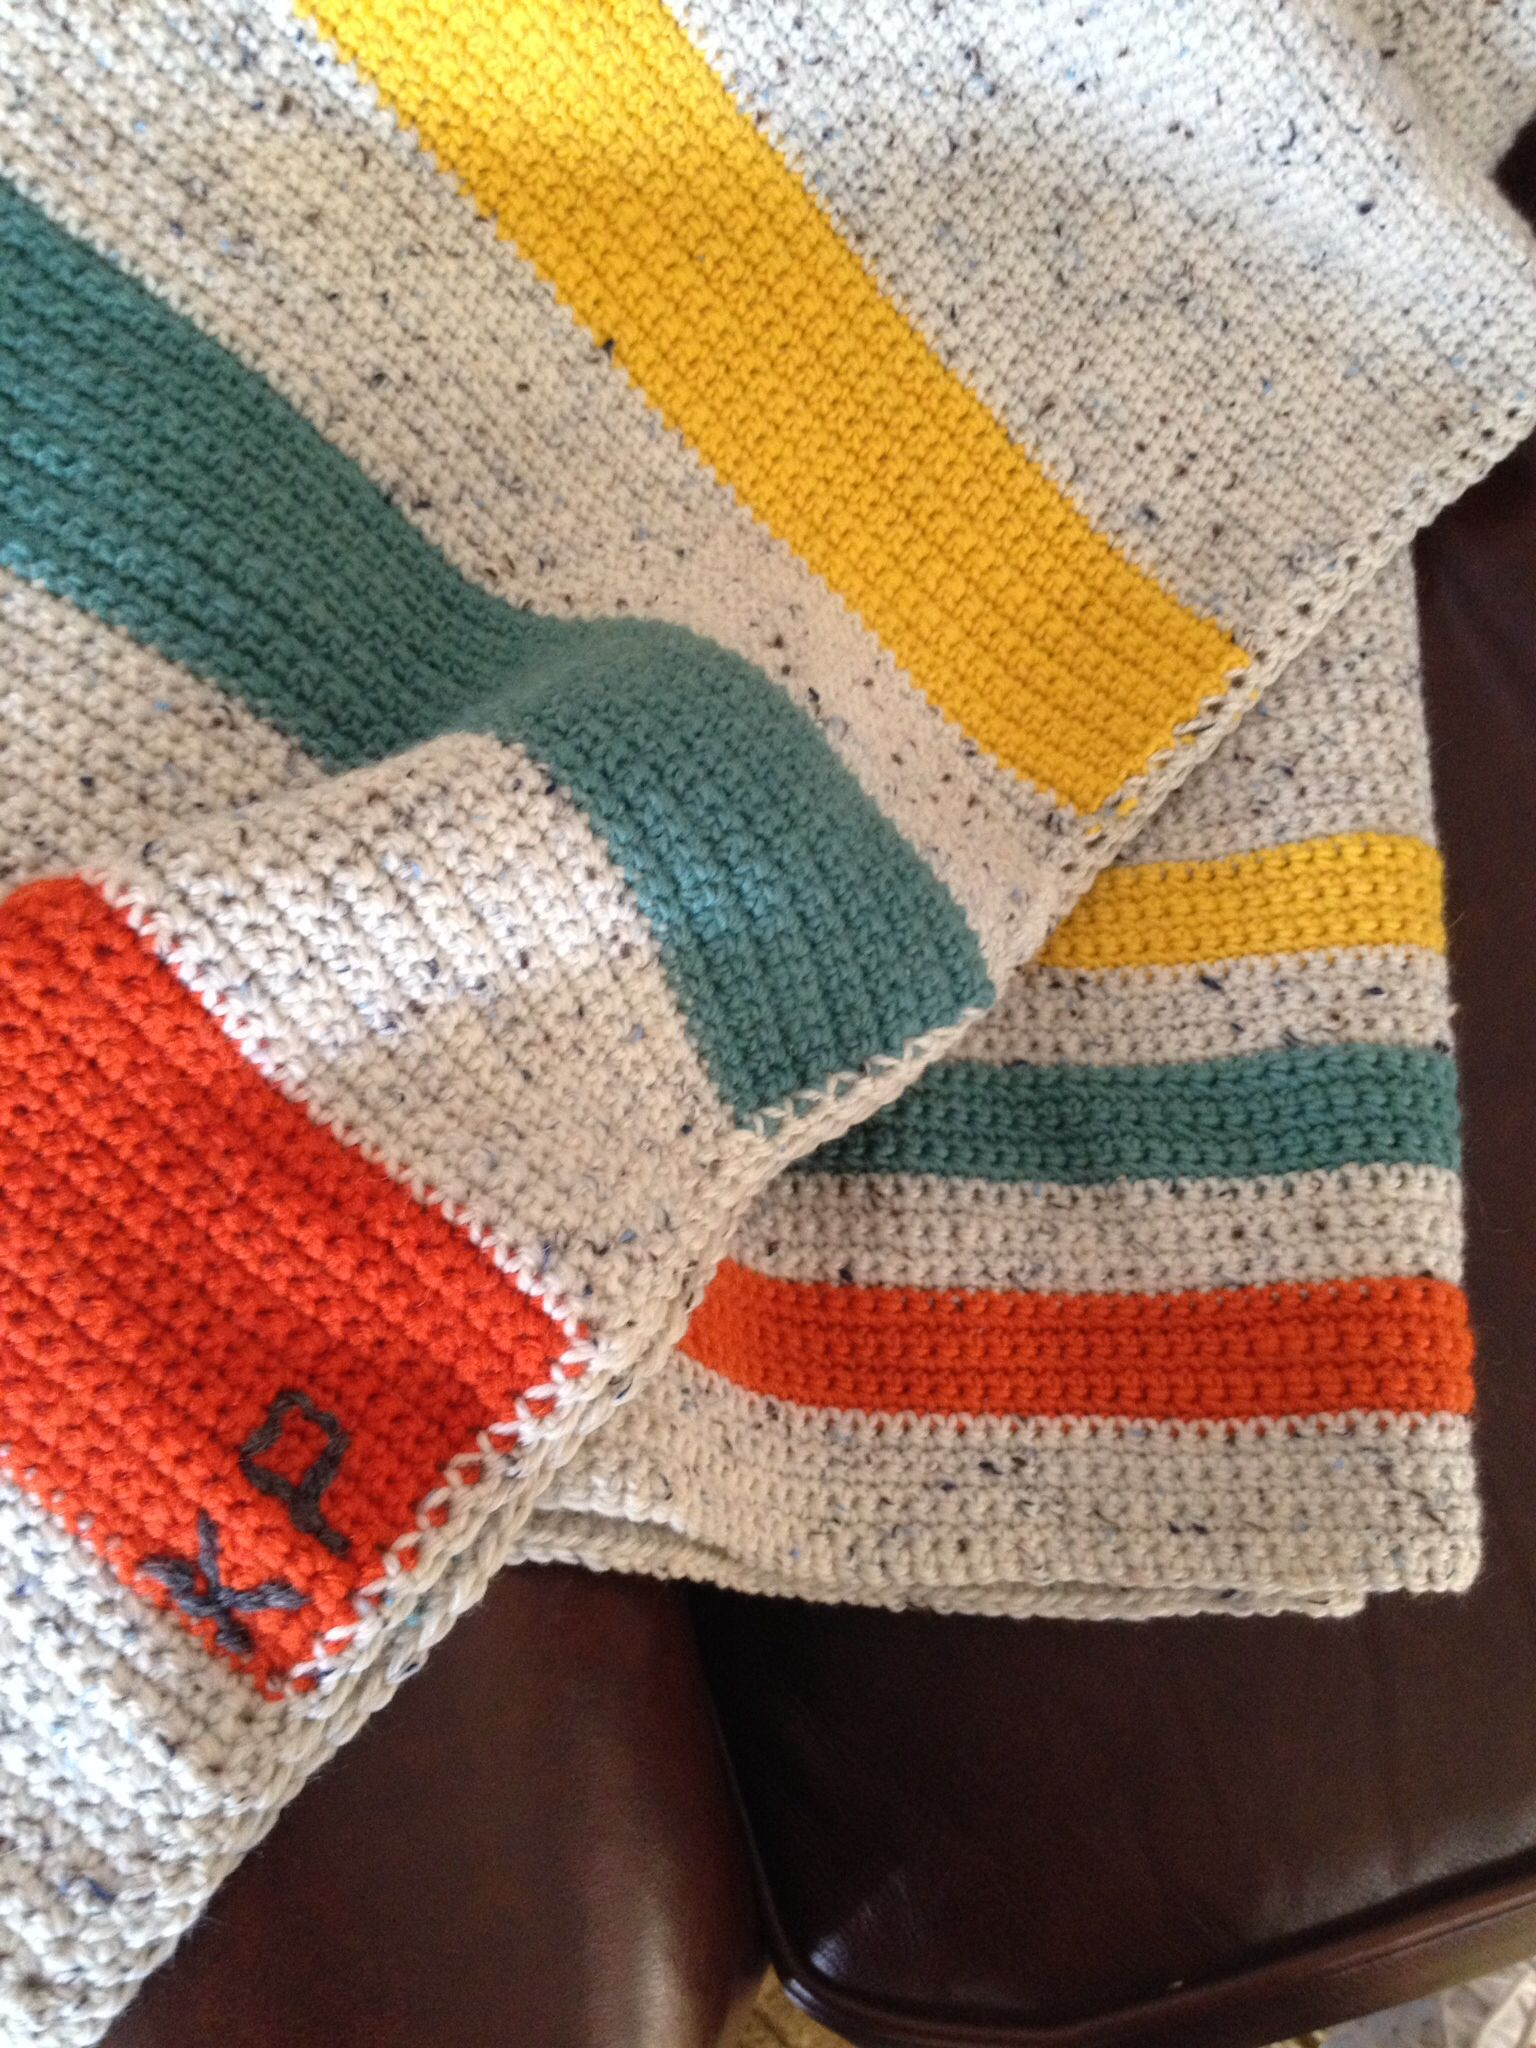 Dating hudson bay blankets